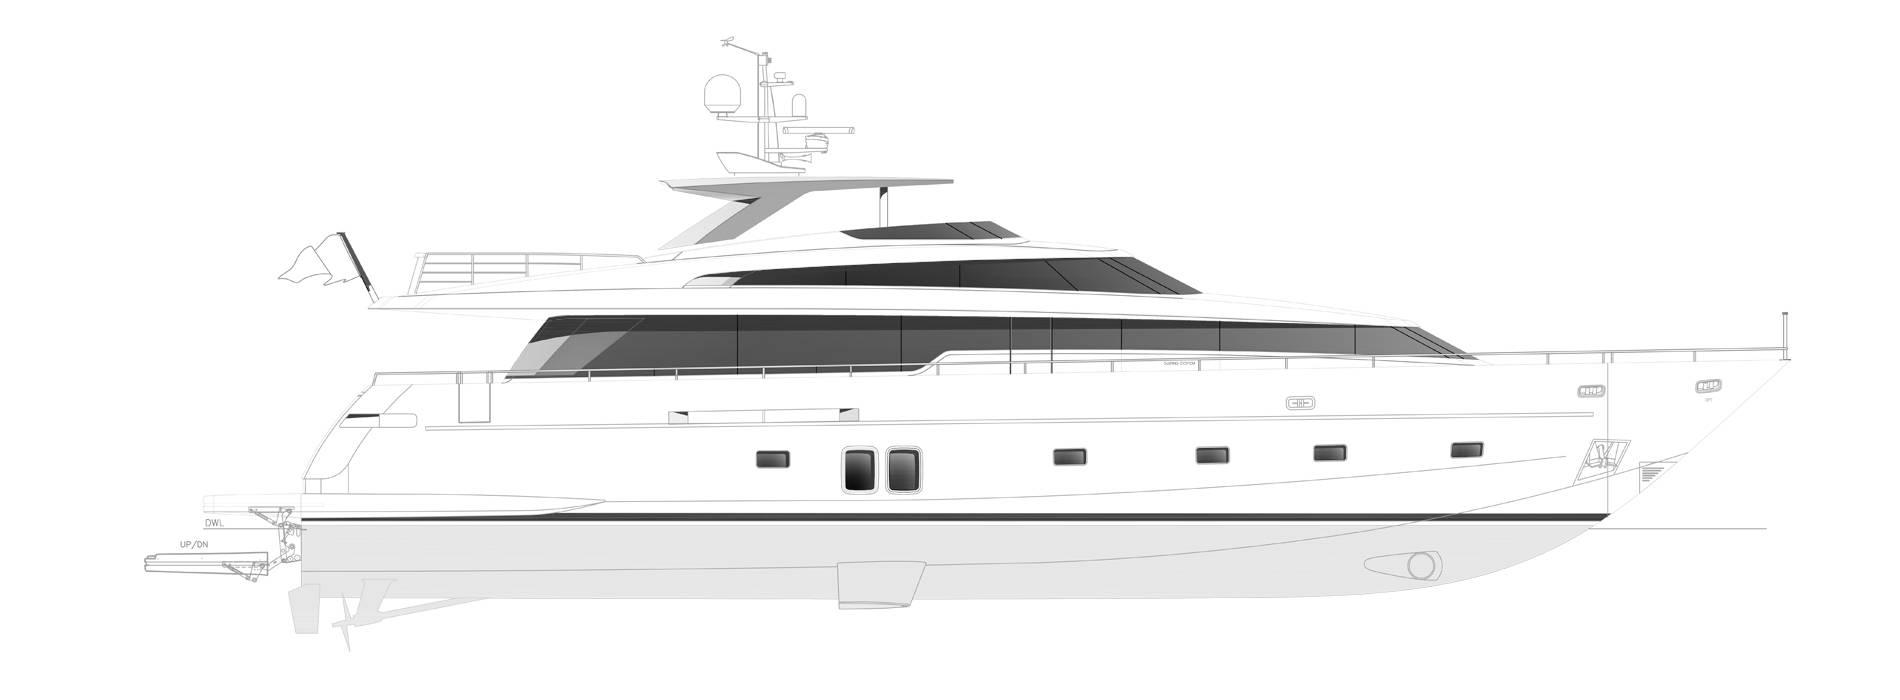 Sanlorenzo Yachts SL96-631 under offer Profile